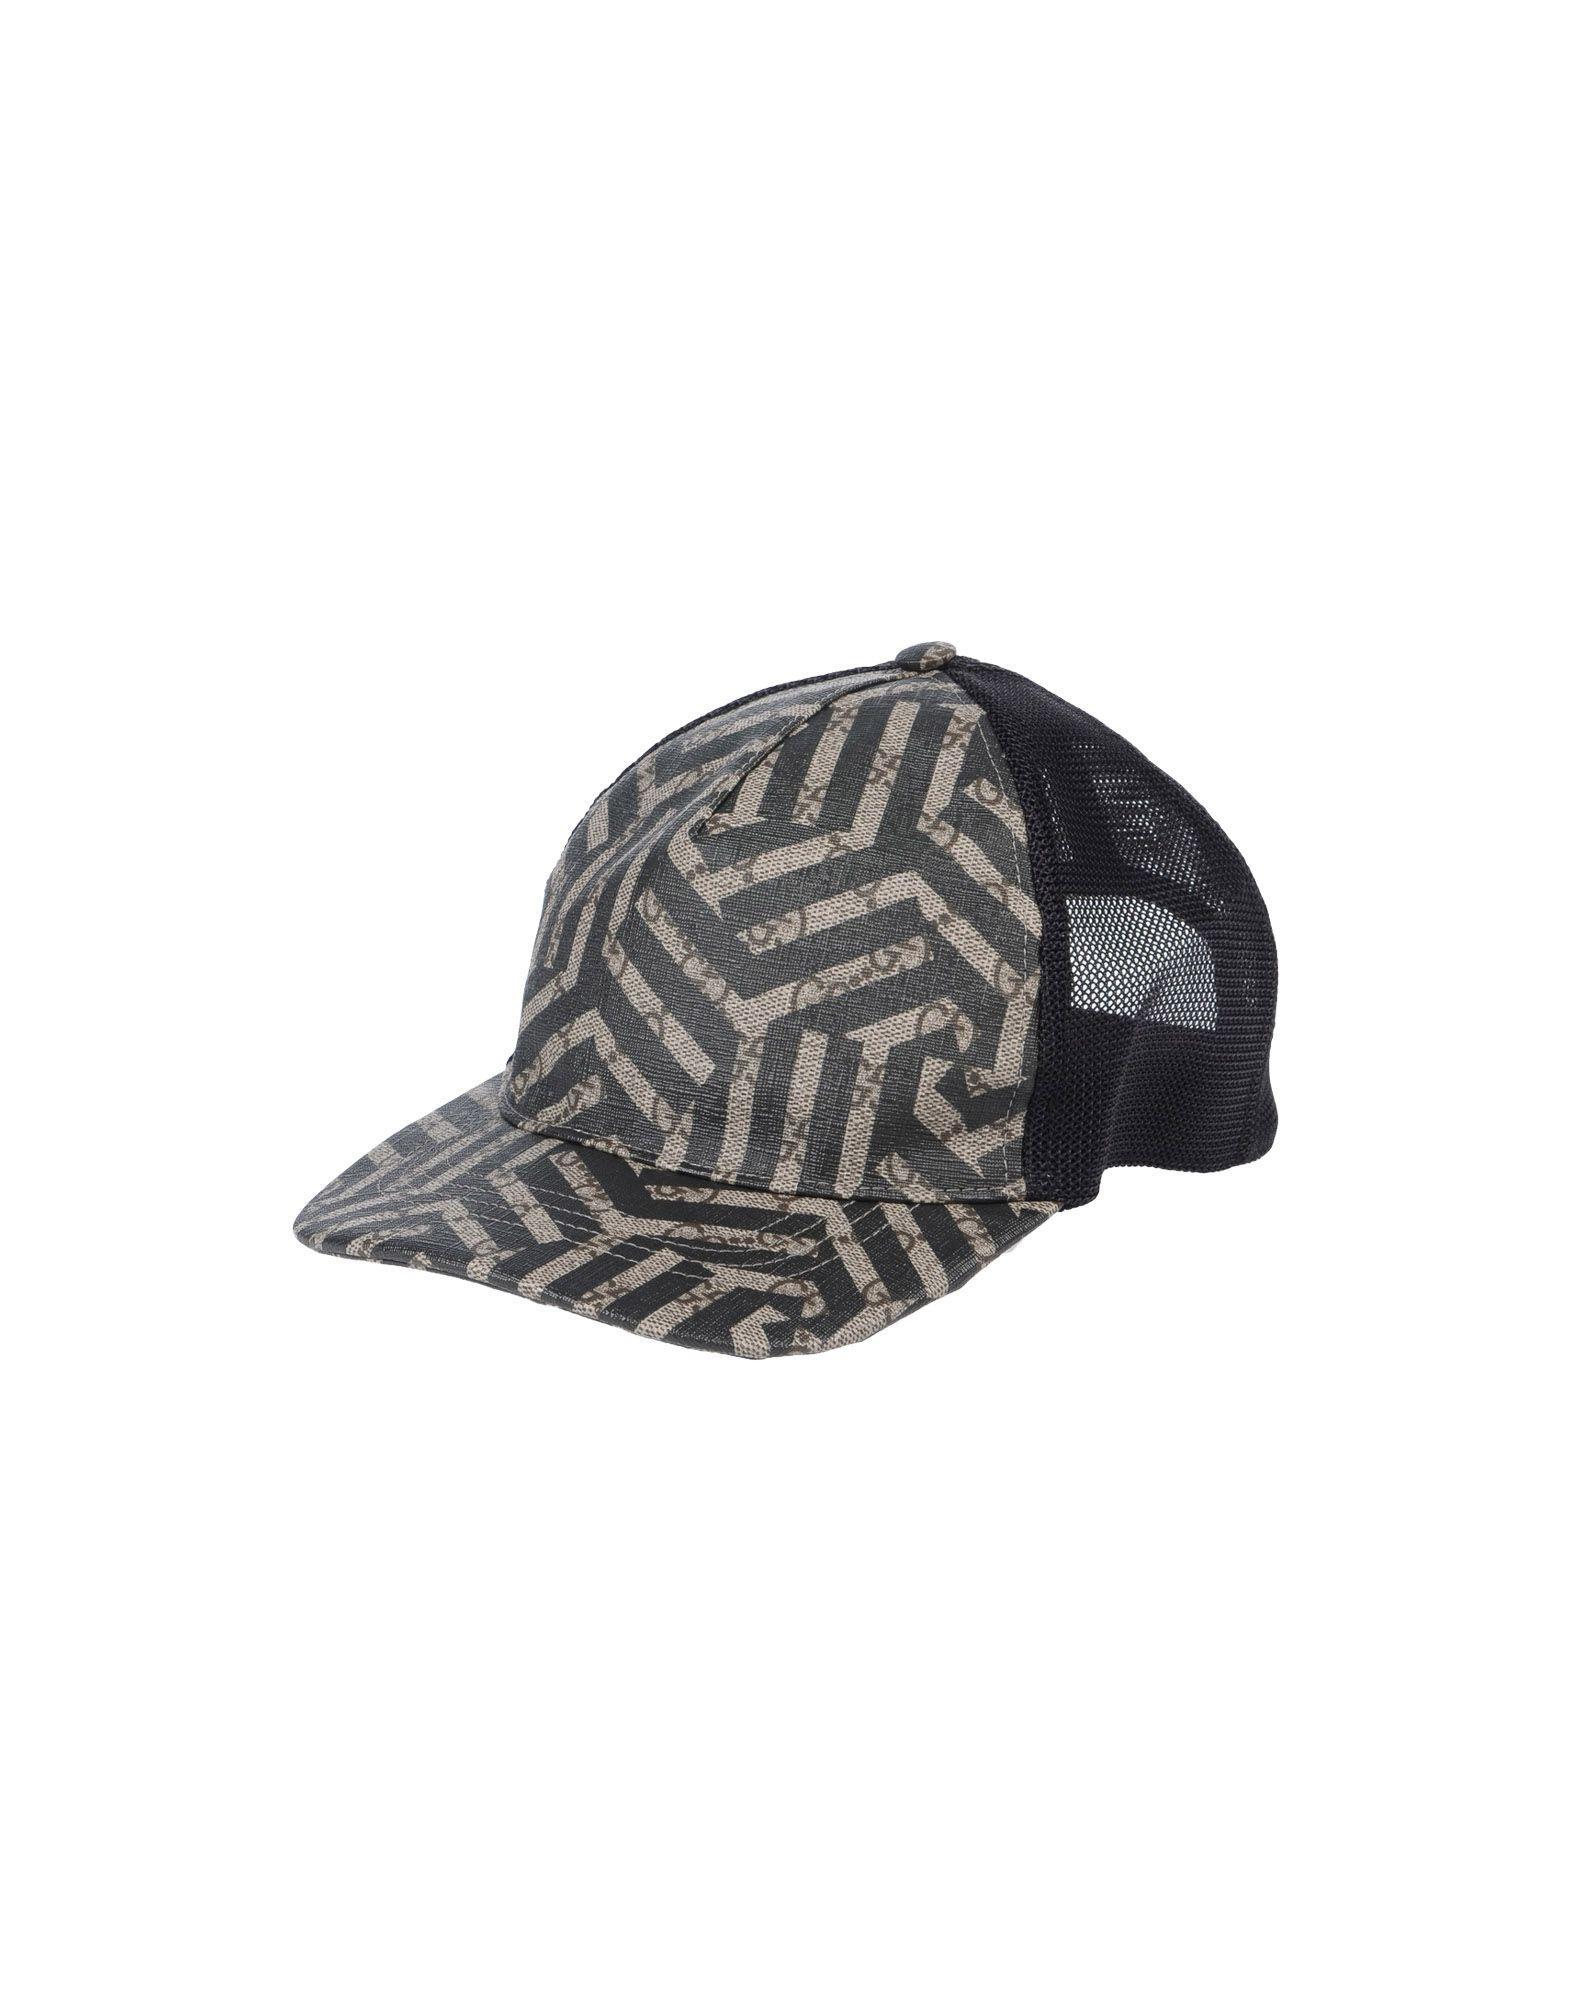 Gucci Hat In Steel Grey